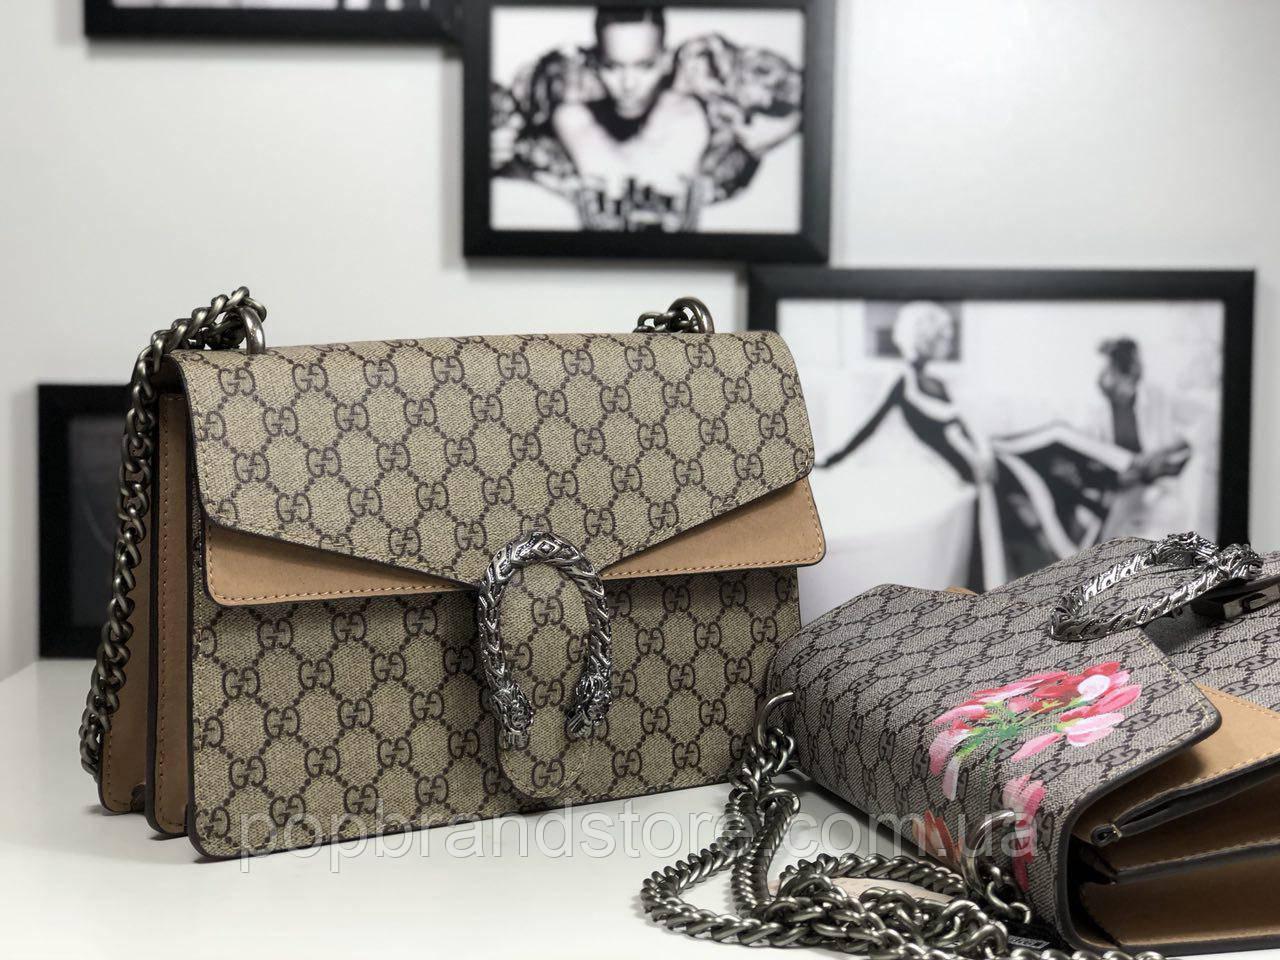 fddc01aee47b Женская сумочка Gucci DIONYSUS BAG LUX беж (реплика): продажа, цена ...